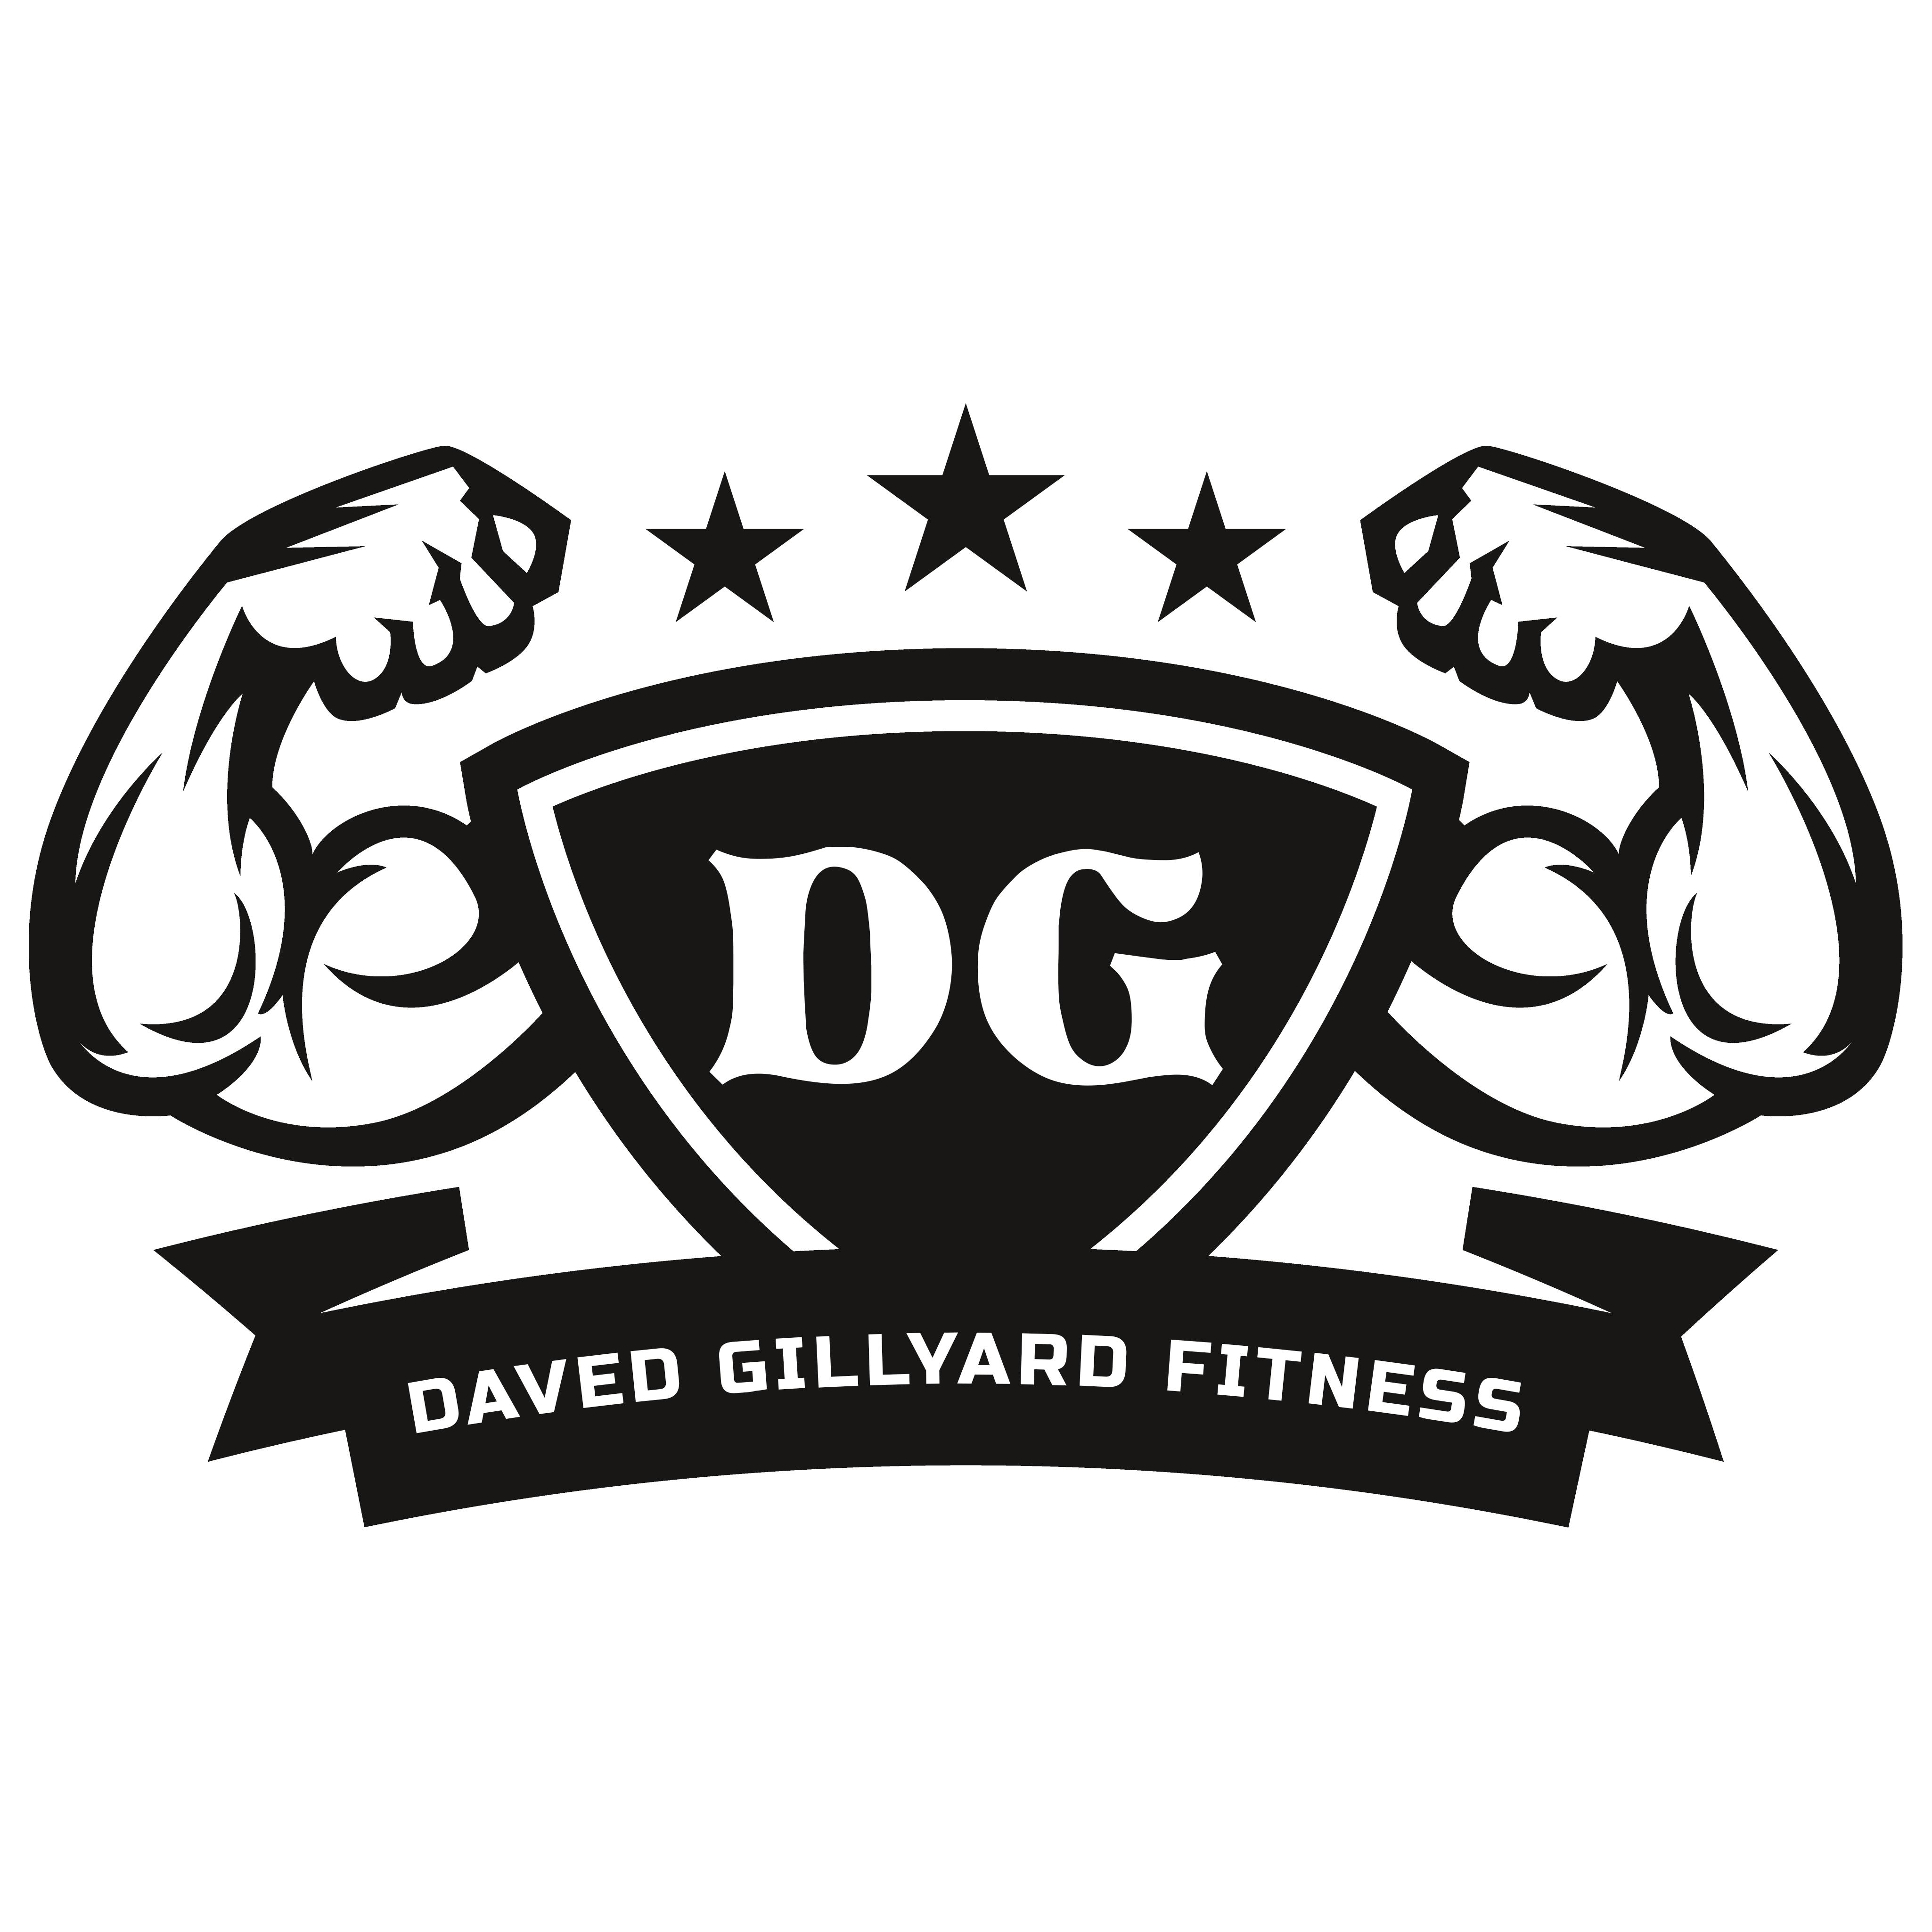 Daved Gillyard Personal Trainer - Sugar Land, TX 77478 - (281)201-1498 | ShowMeLocal.com